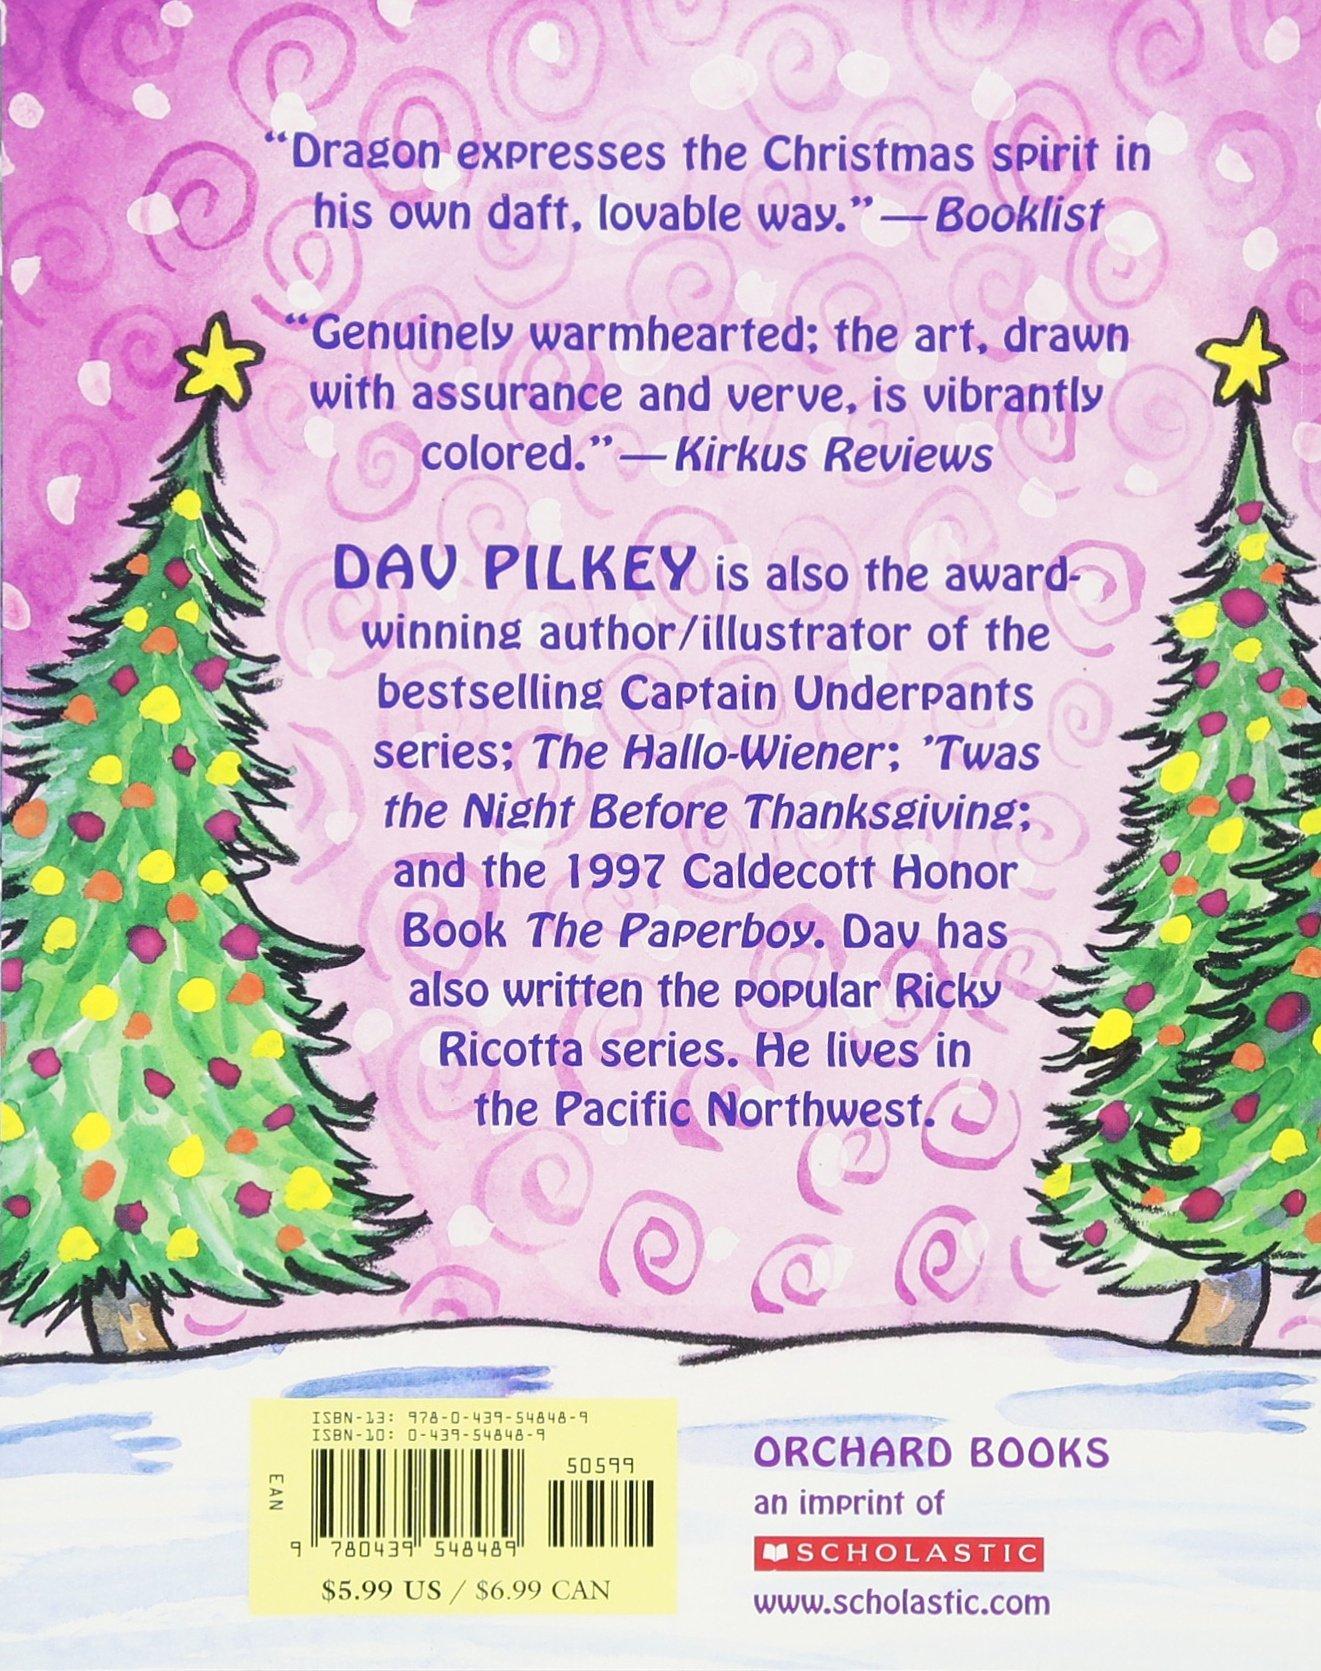 Amazoncom Dragons Merry Christmas 9780439548489 Dav Pilkey Books